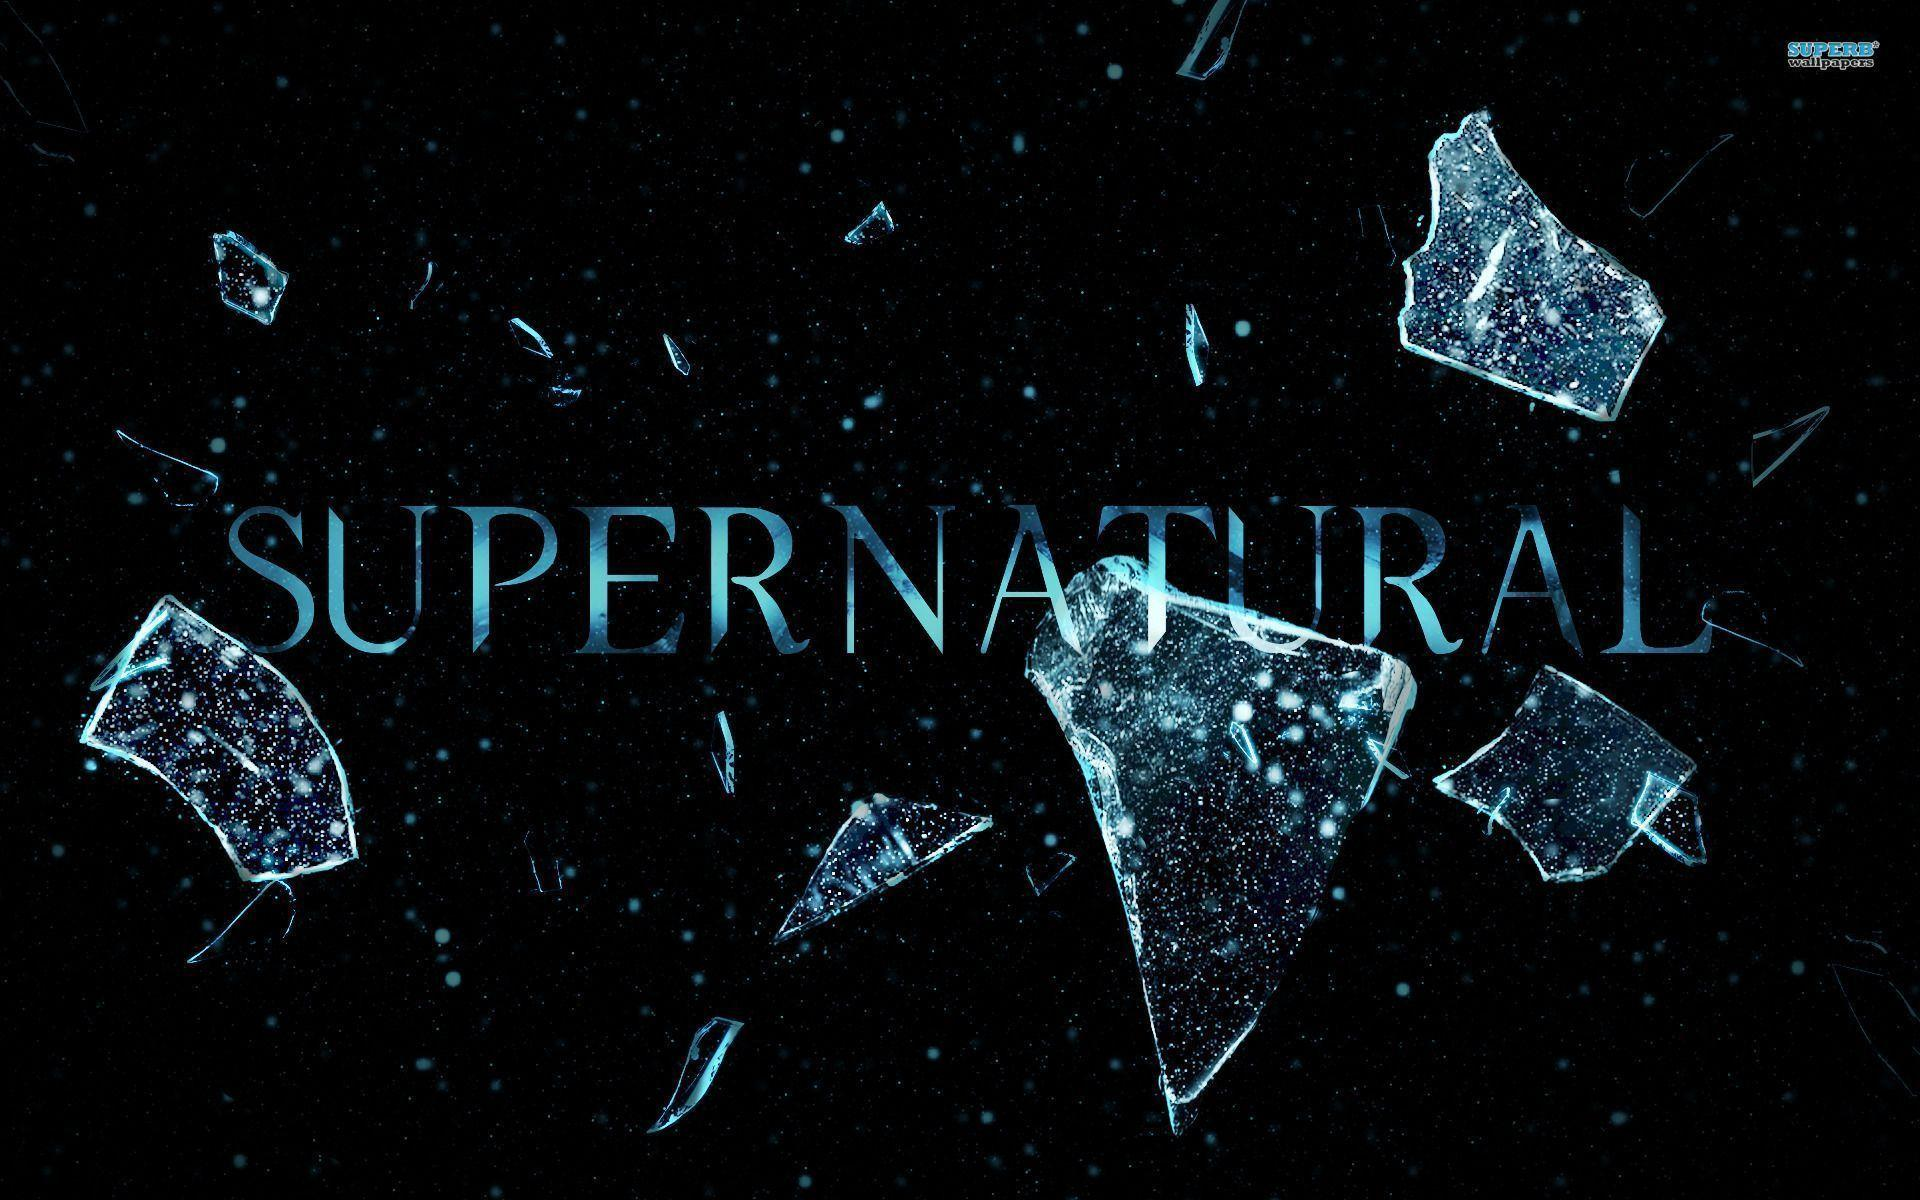 supernatural-wallpaper-280 | home plans